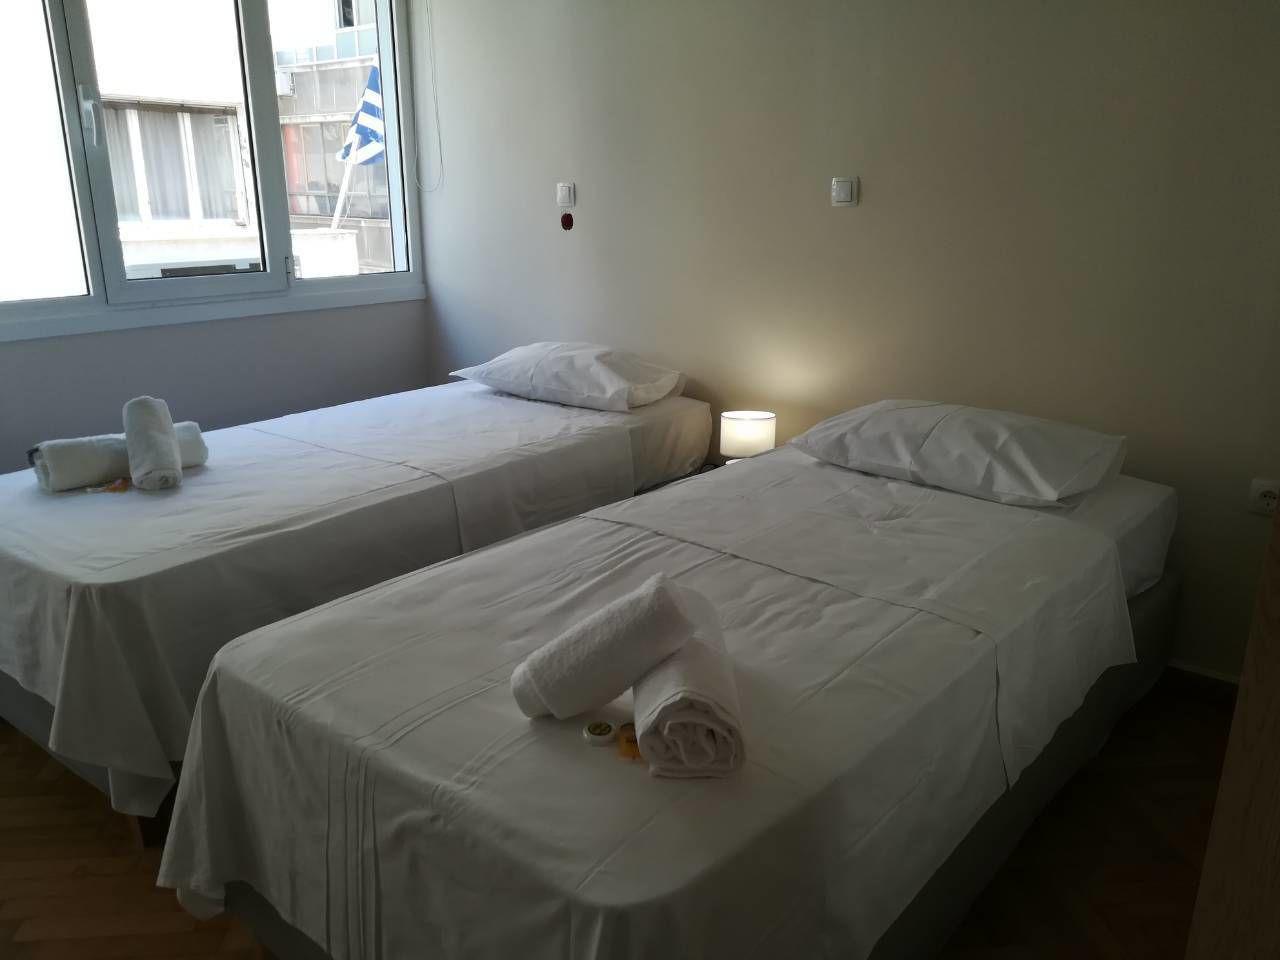 Kaniggos - 3 Bedrooms Apartment